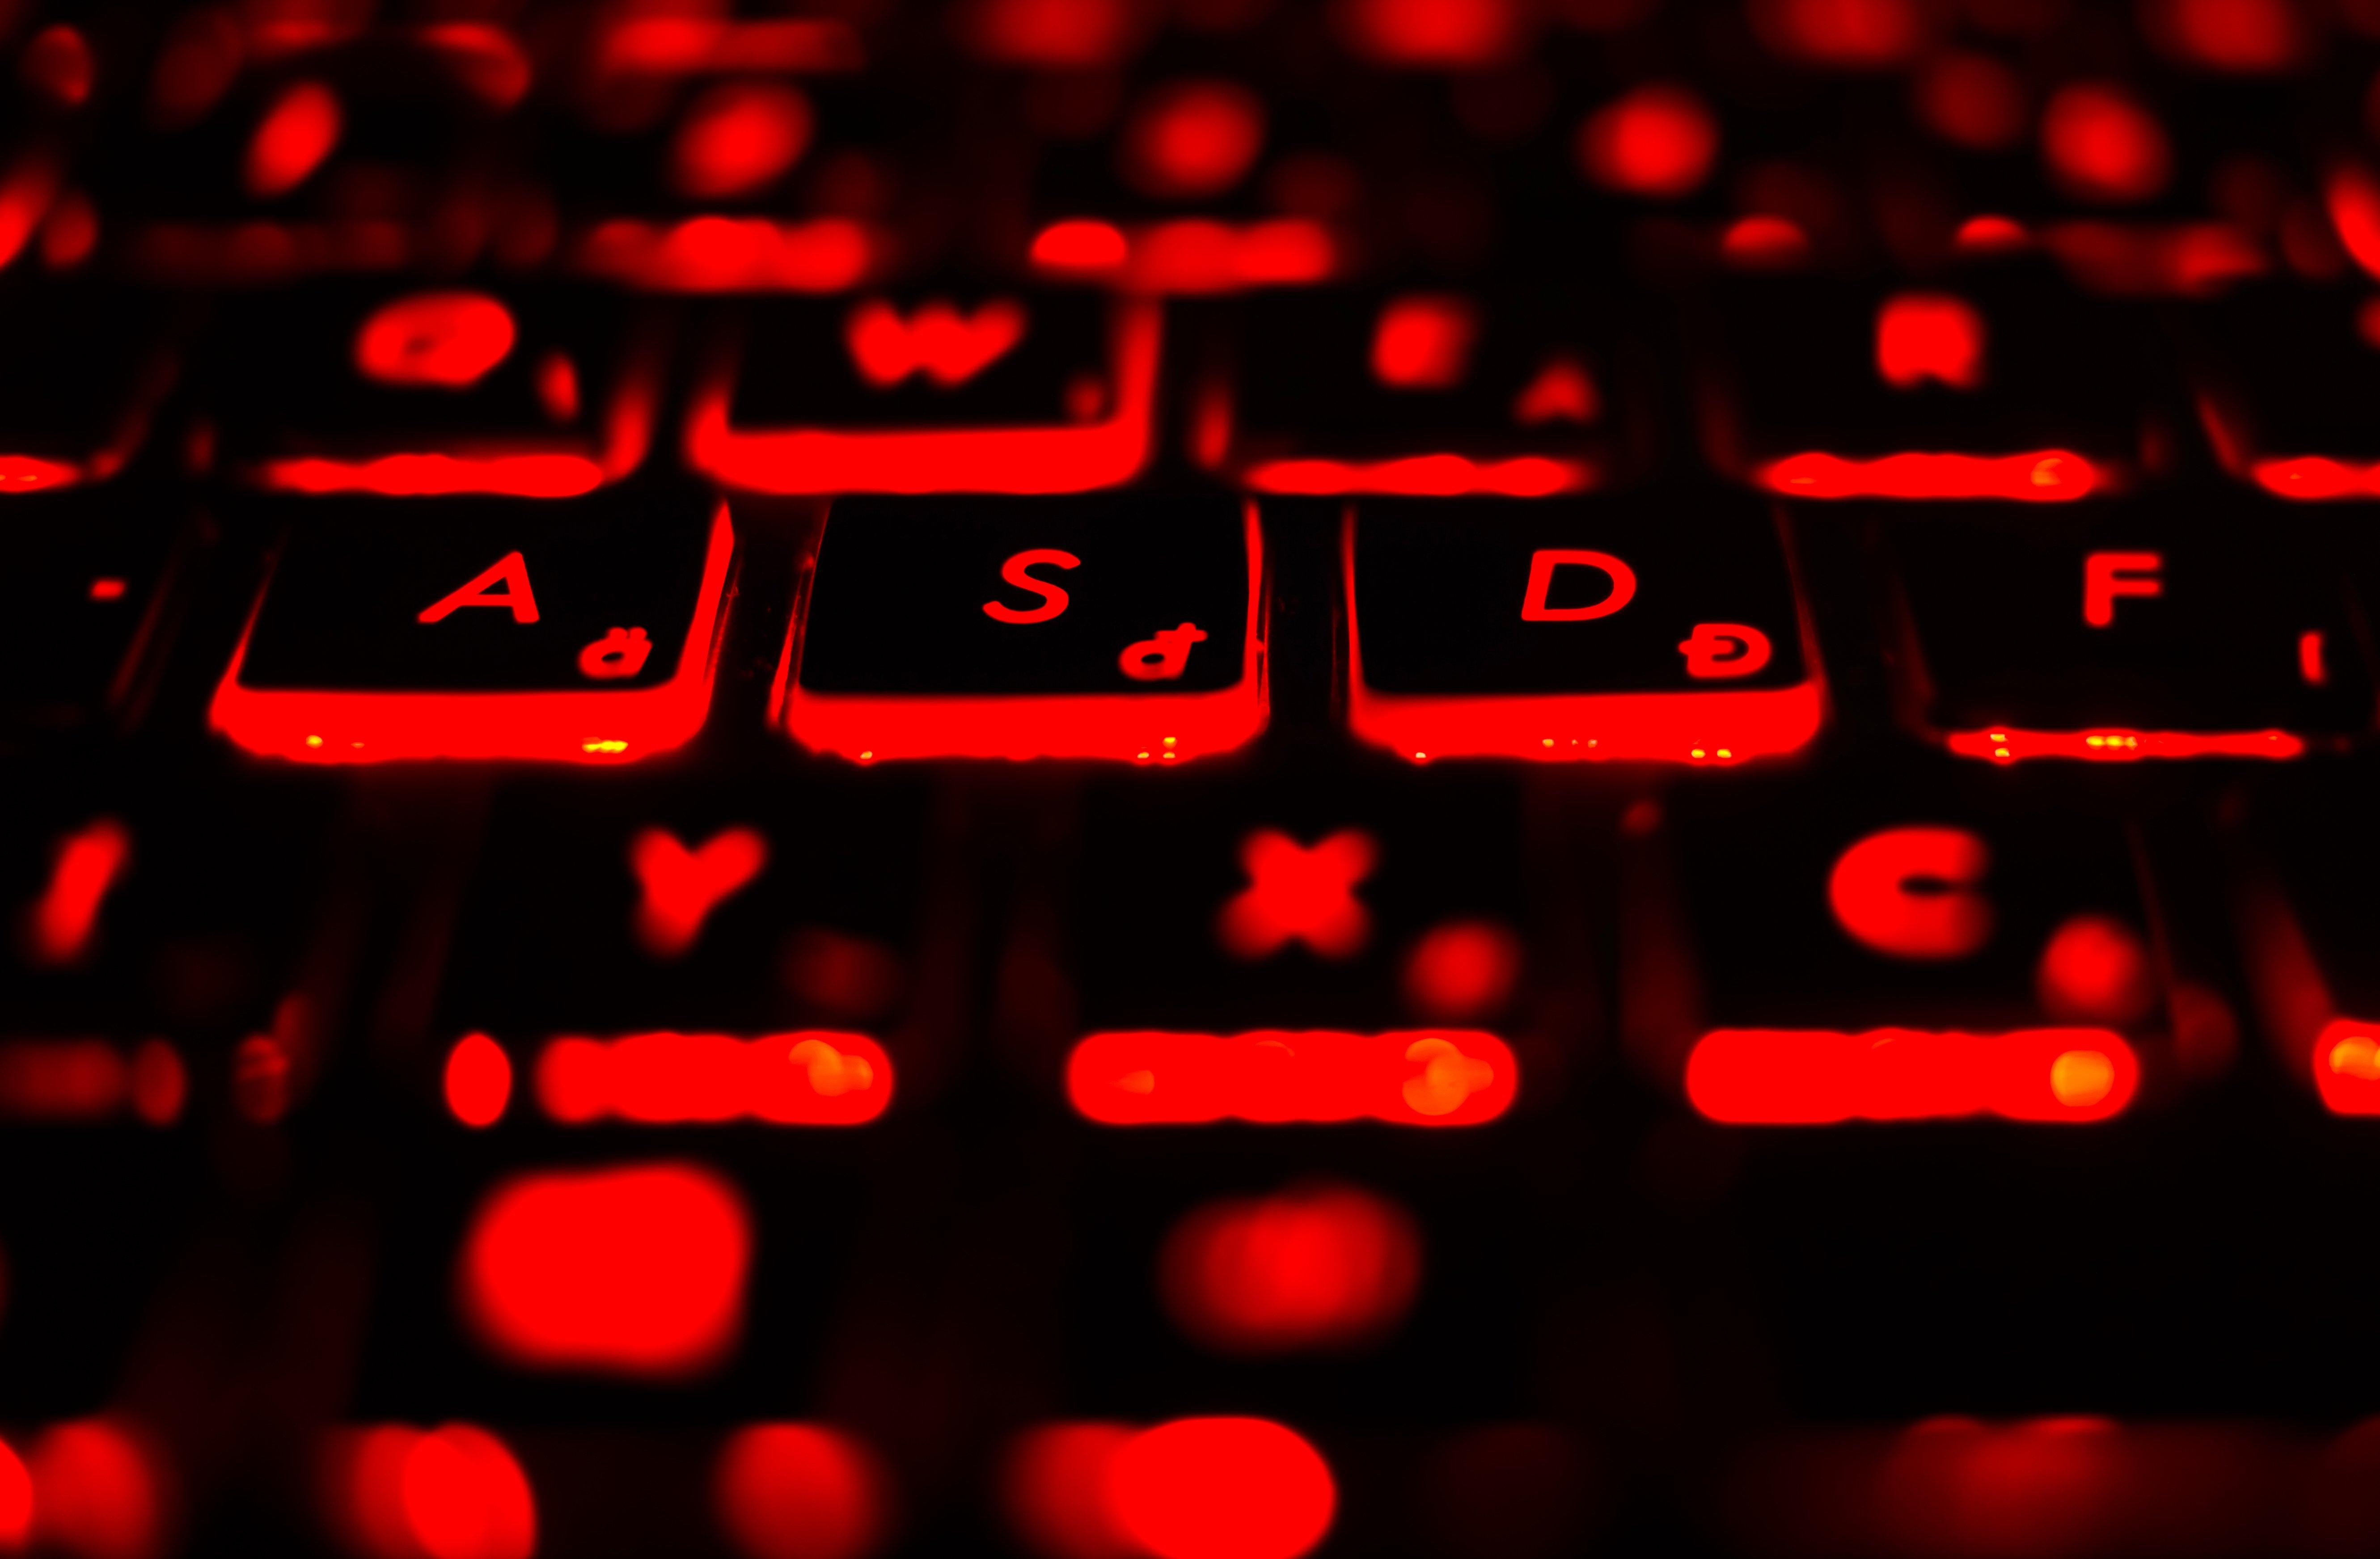 Wallpaper : red, text, macro, Sony, Gamer, neon sign, keys